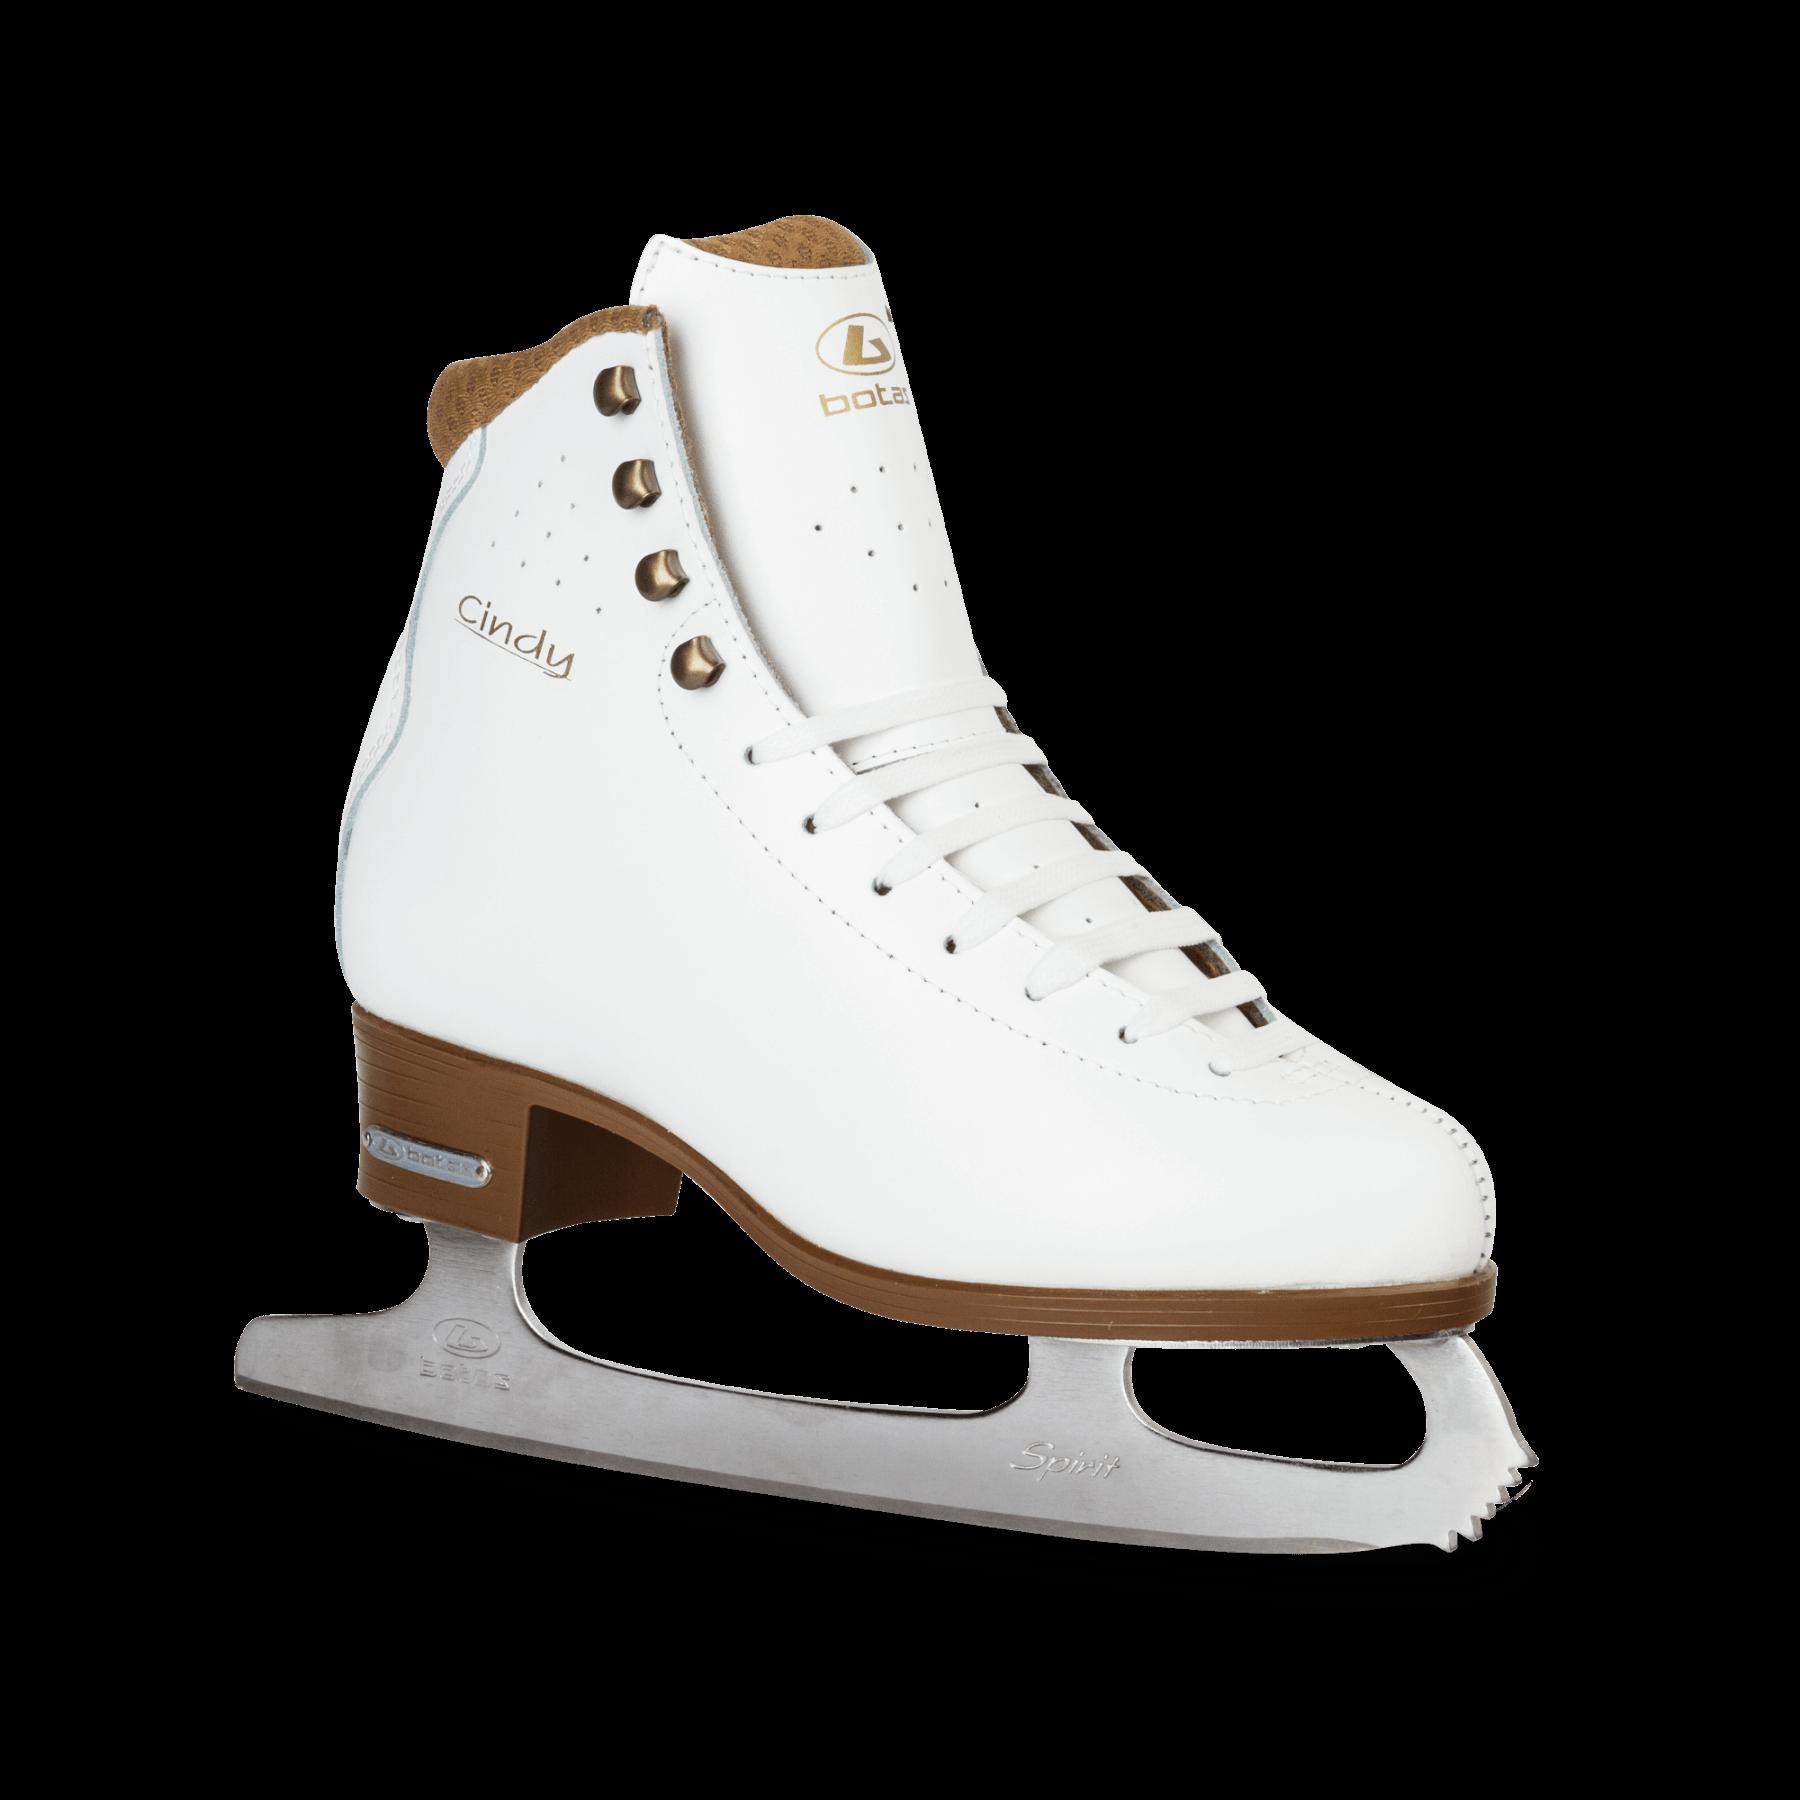 Skate image png transparent. Winter clipart ice skating